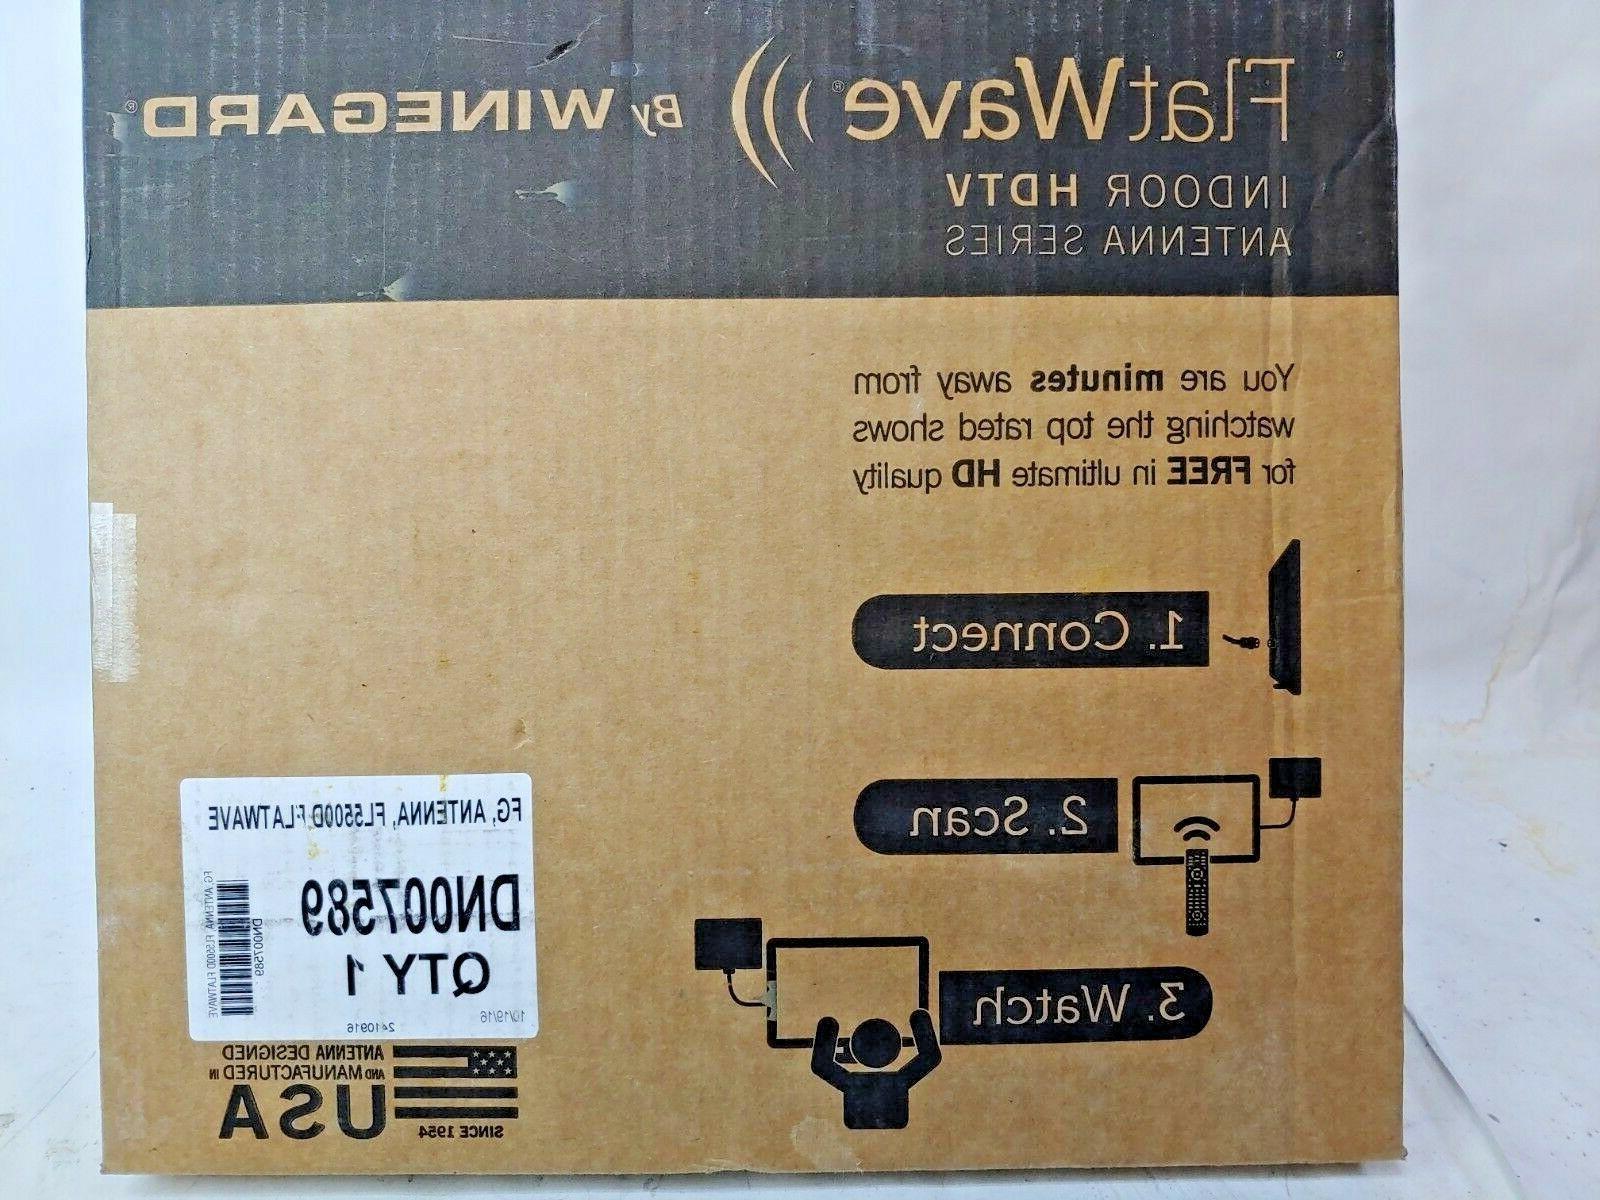 flatwave amped fl5500d digital hd indoor amplified